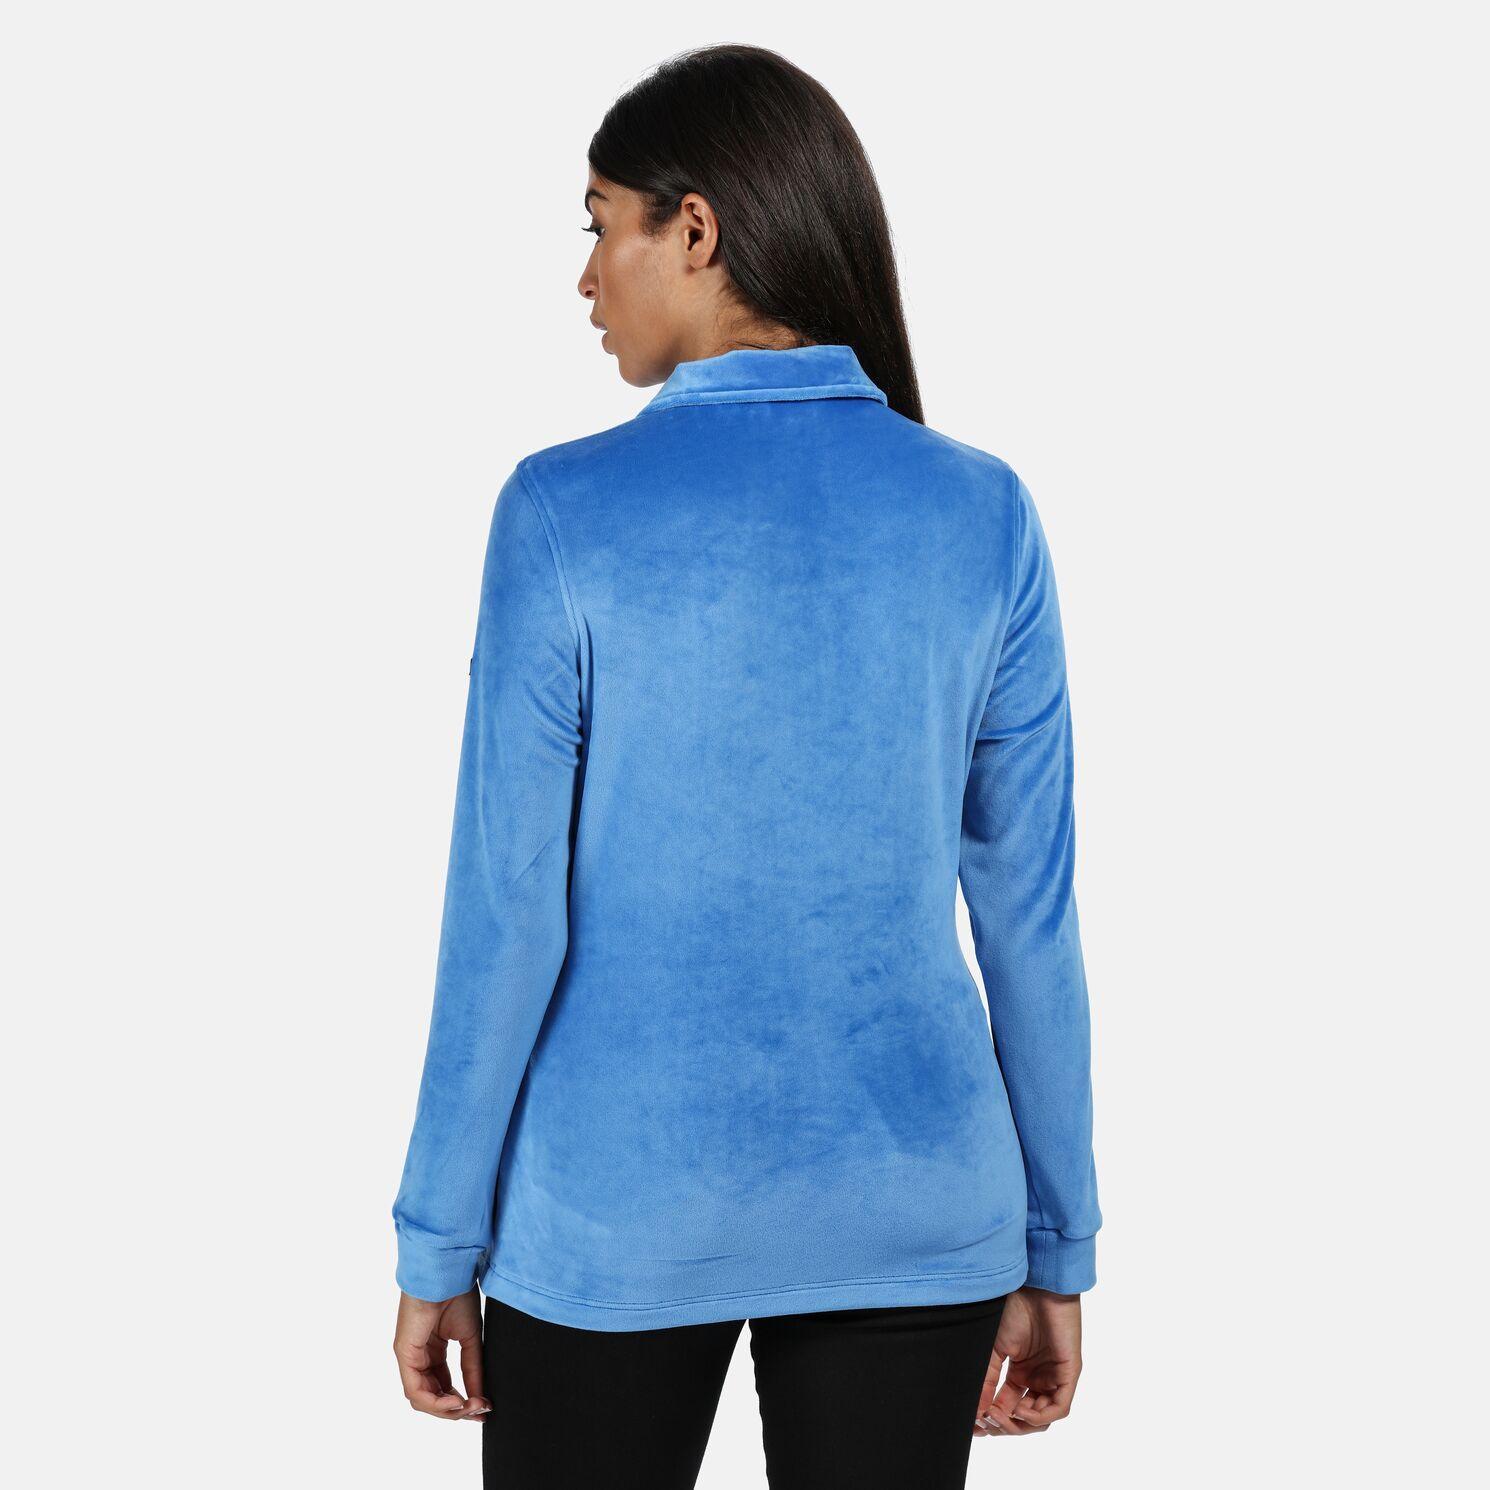 Regatta Womens/Ladies Odelia Full Zip Heavyweight Fleece